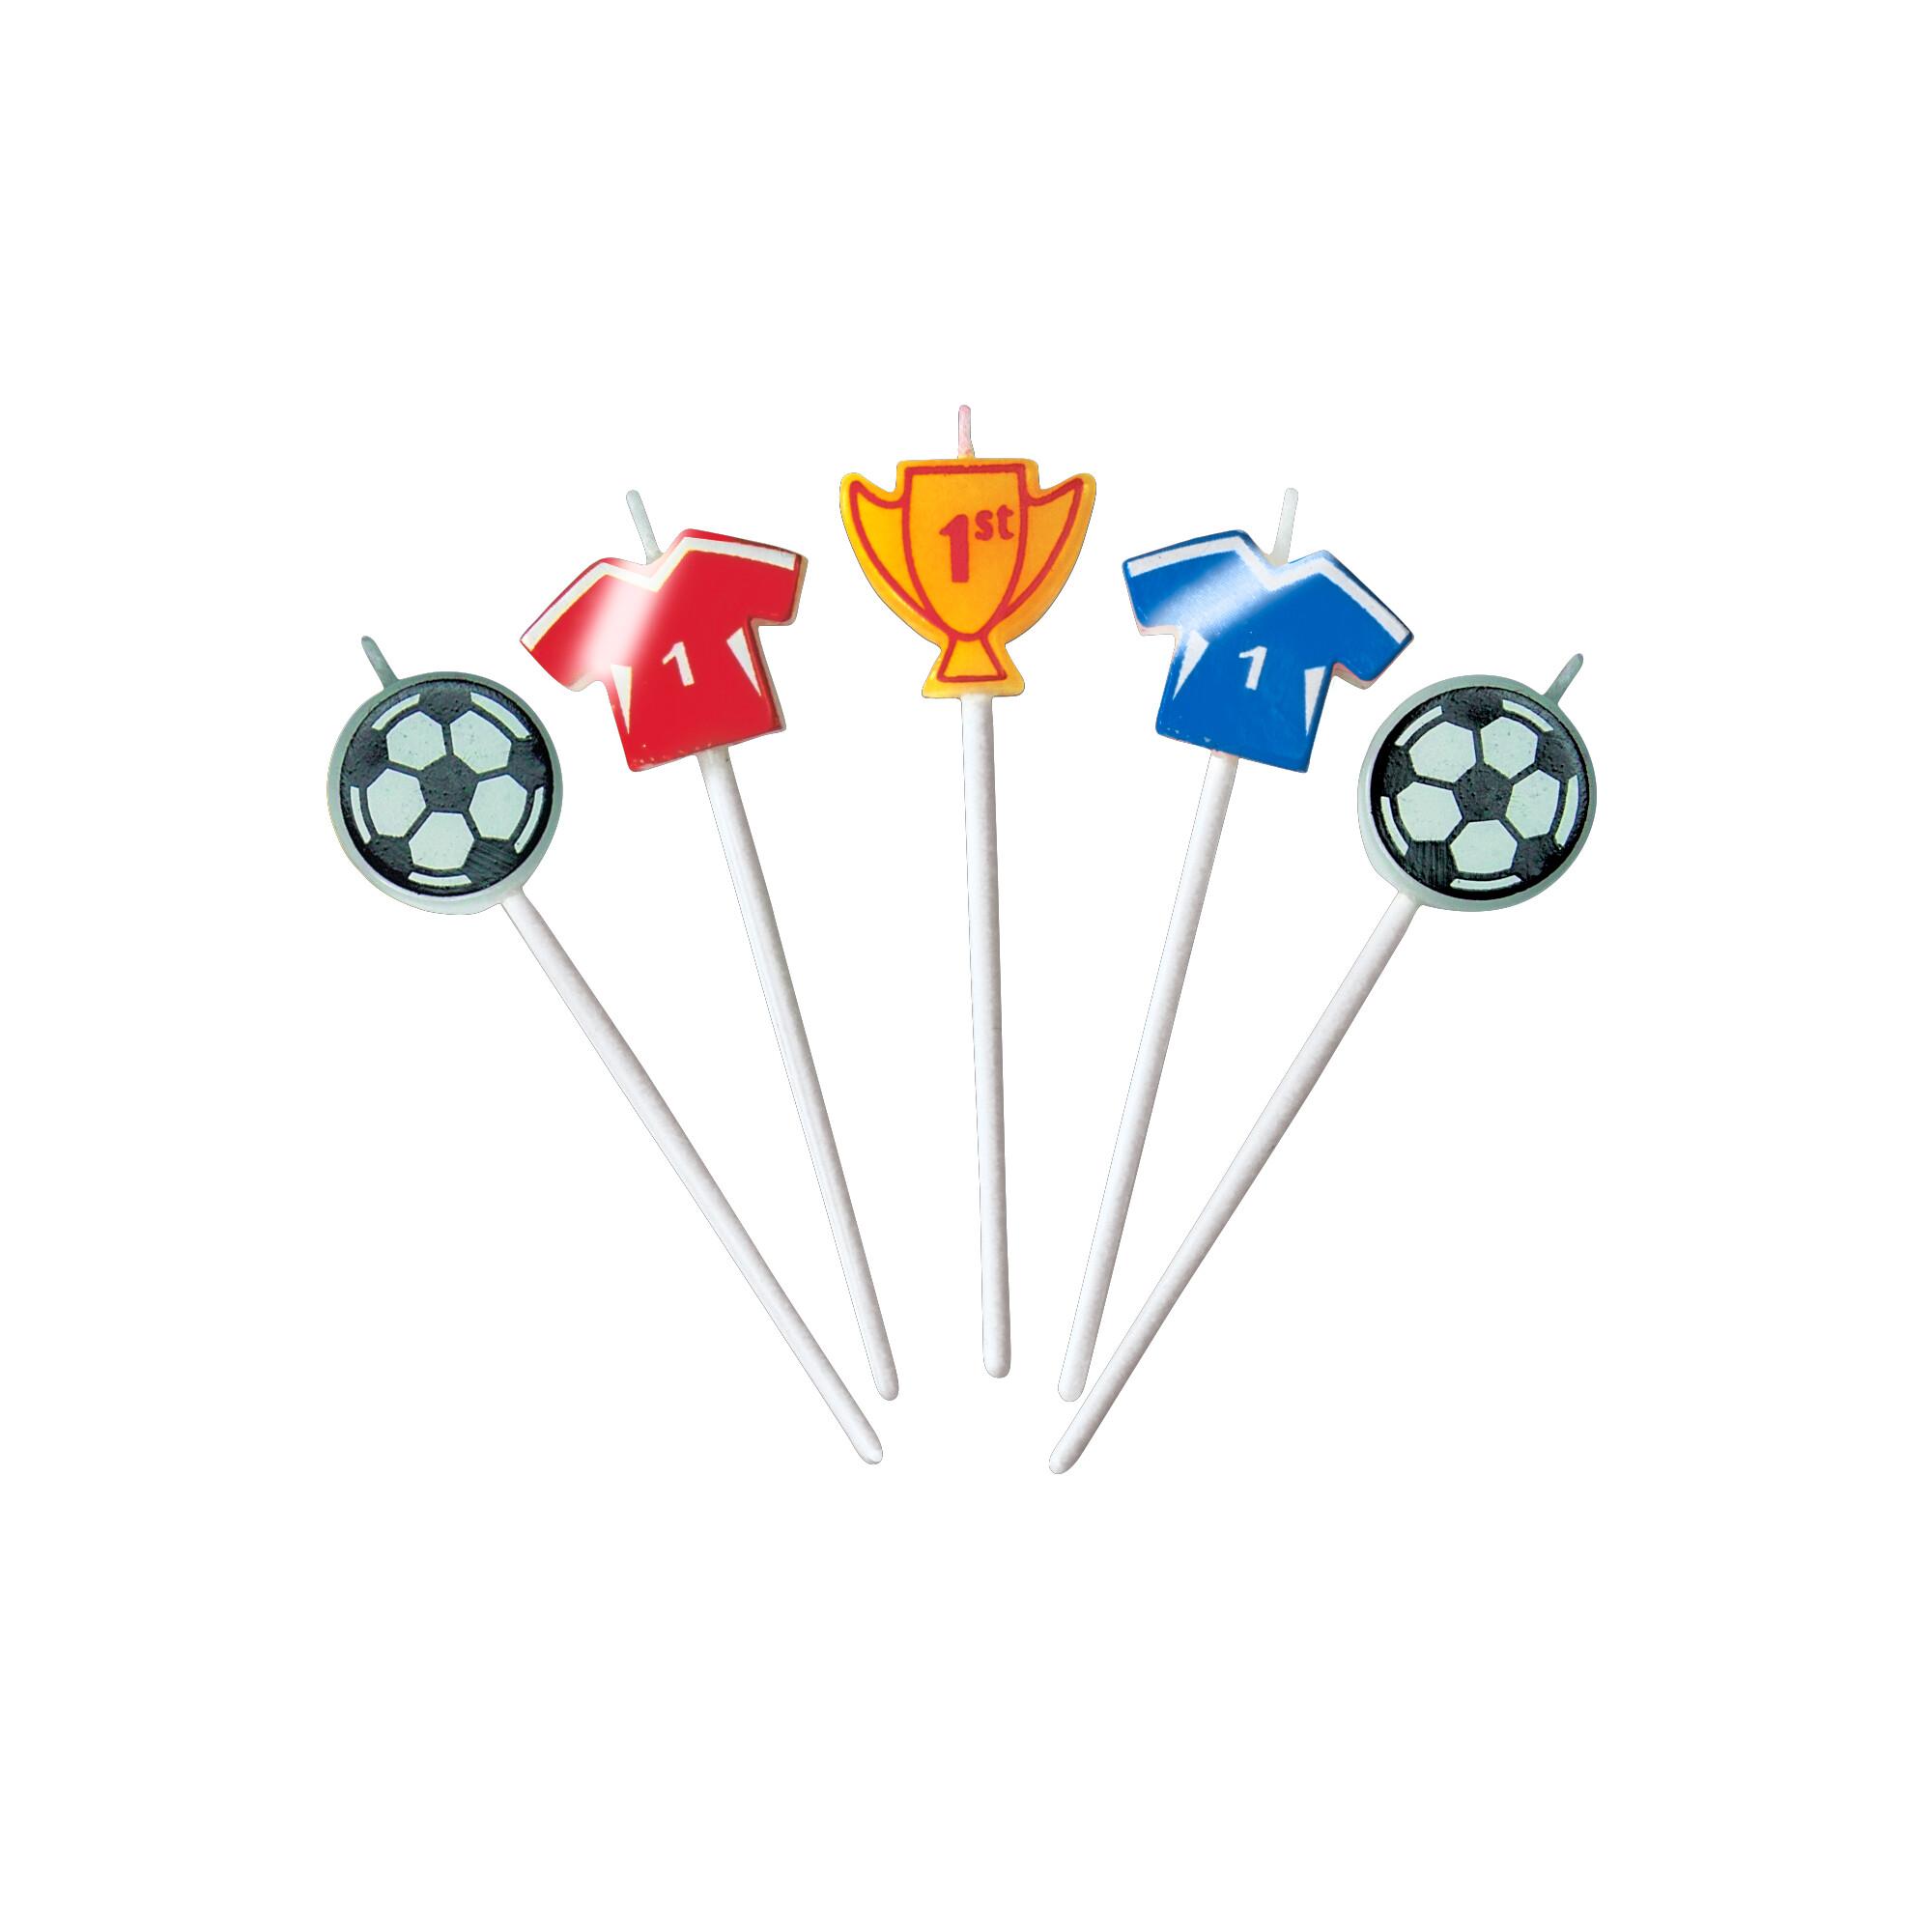 Kerzen - Fußball - Sticks - Set, 5-teilig